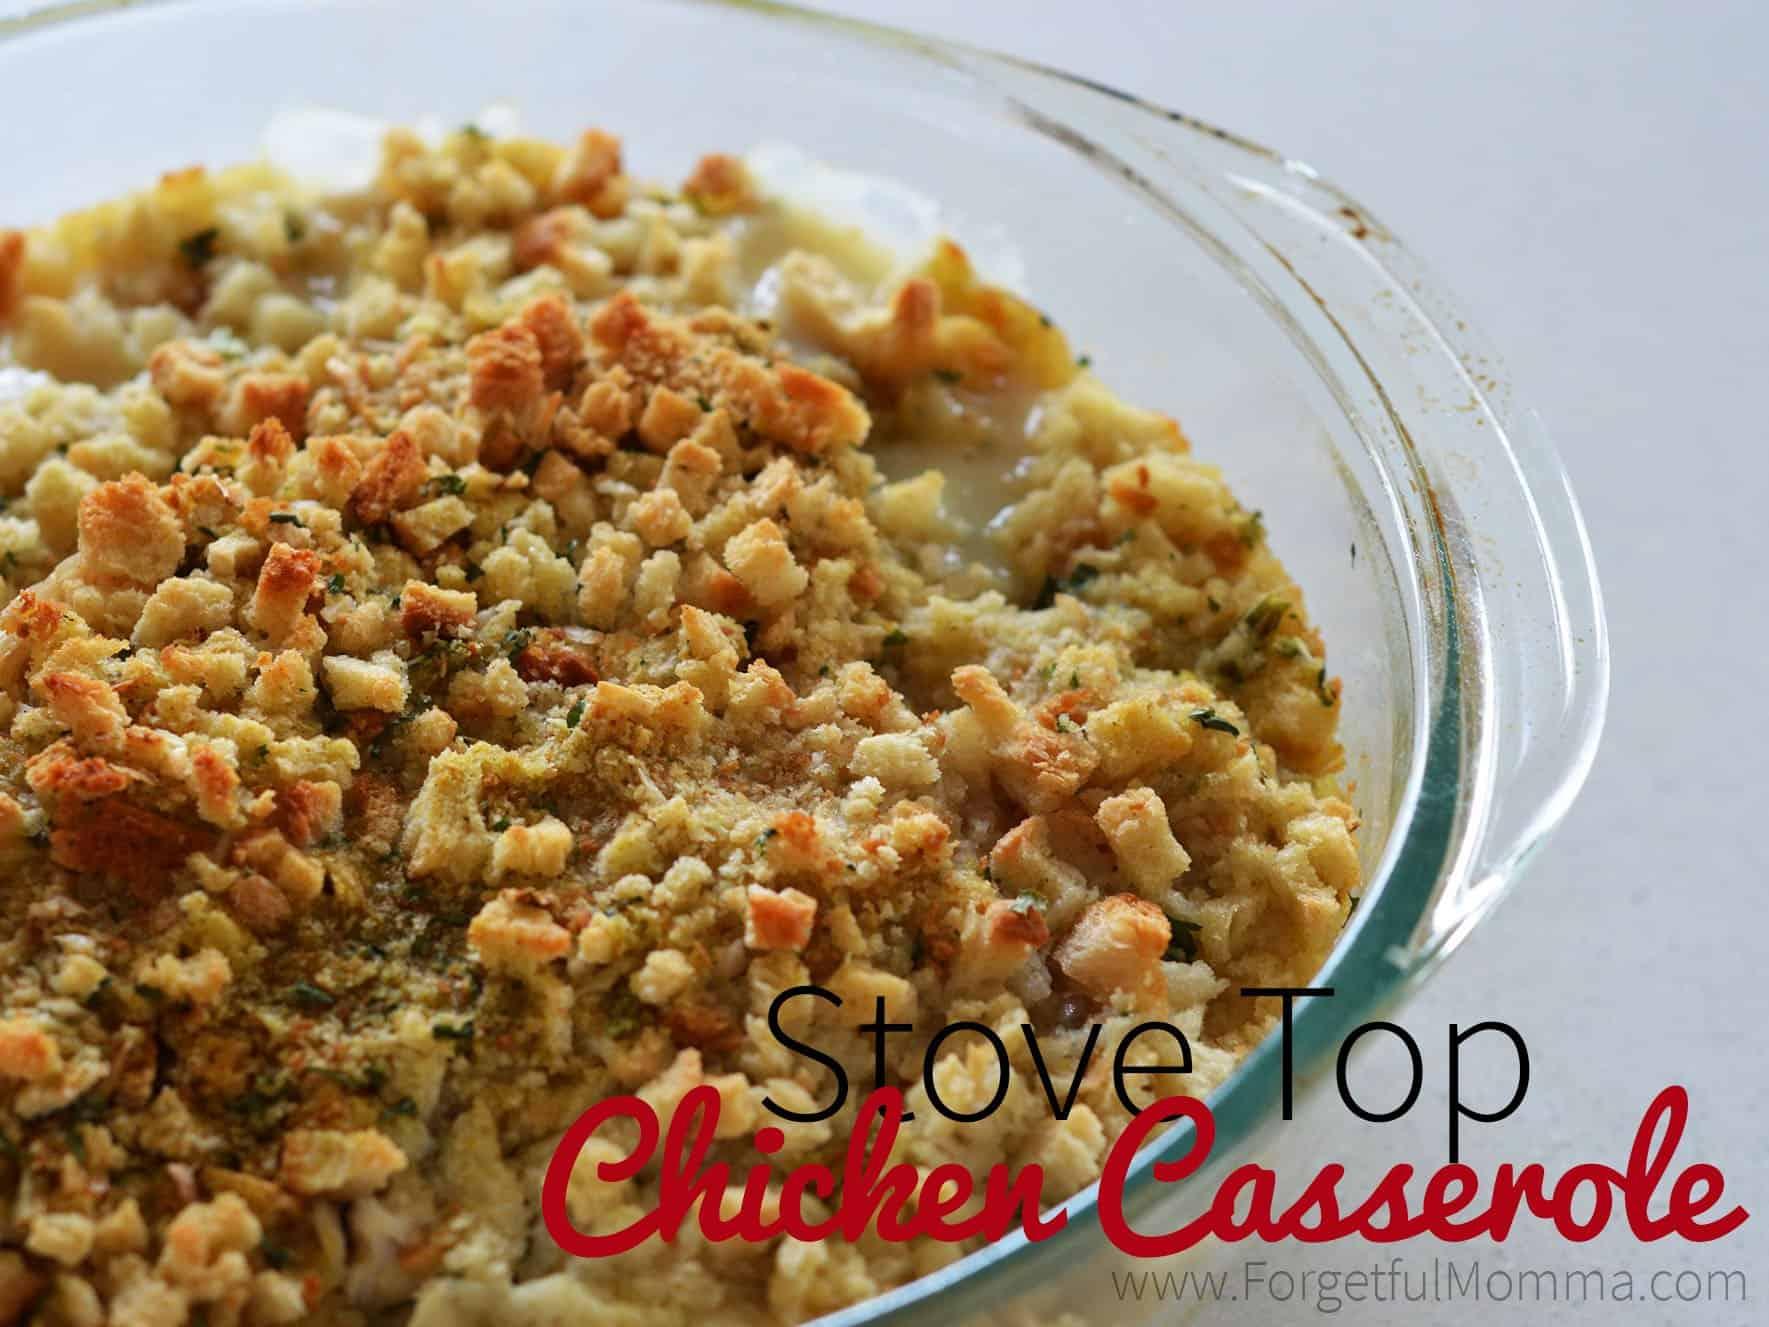 Stove Top Chicken Casserole